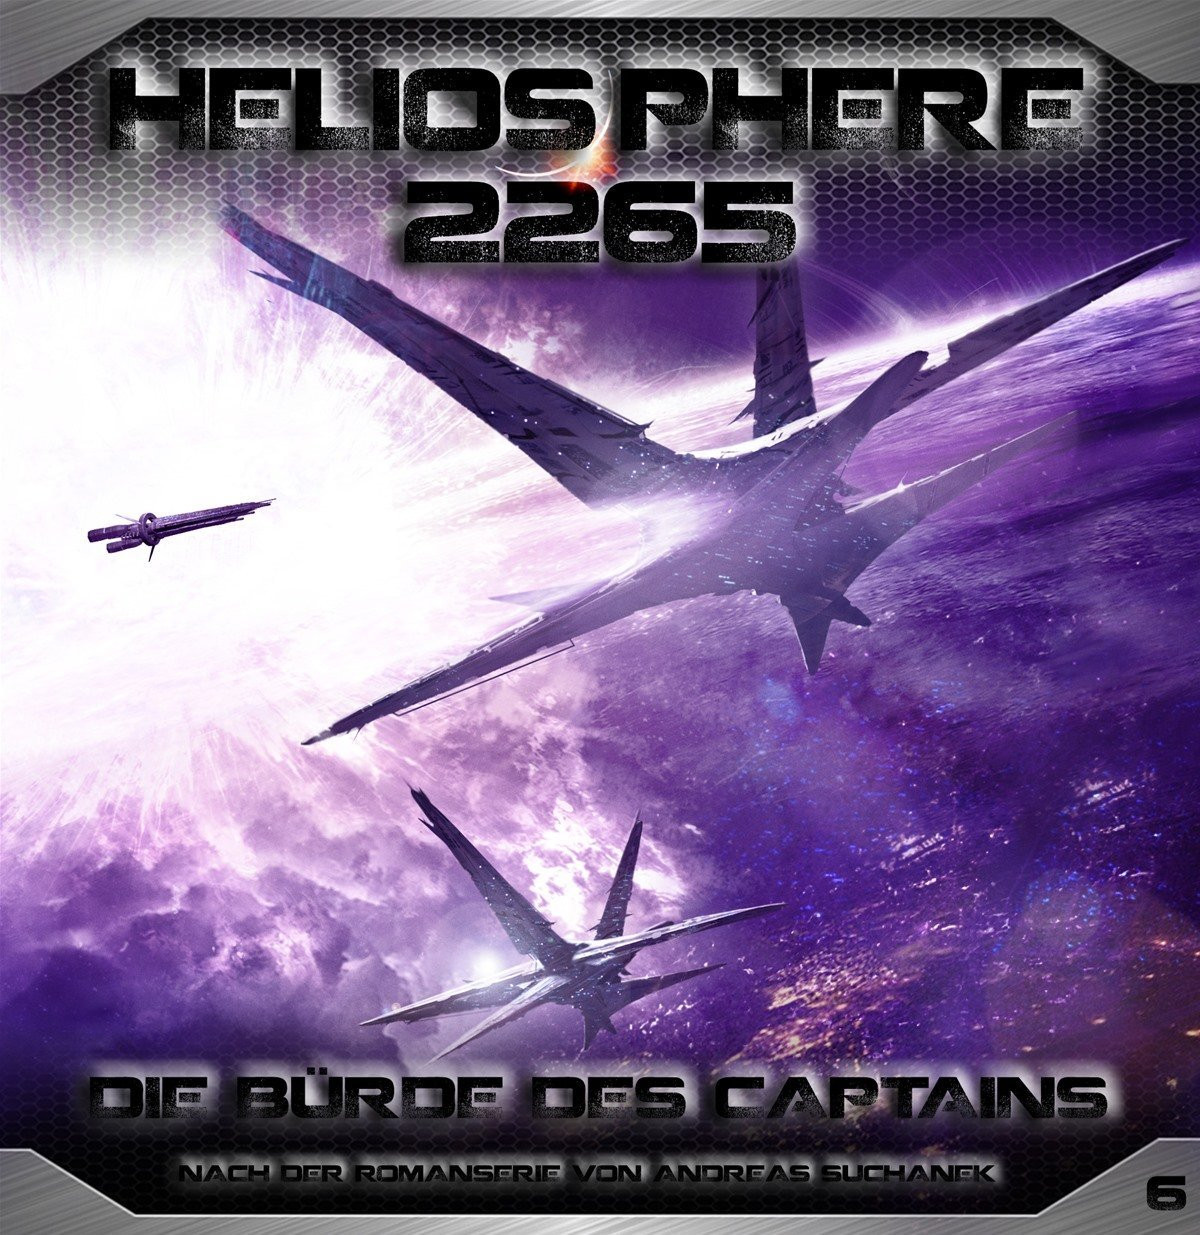 Heliosphere 2265 - Folge 6: Die Bürde des Captains